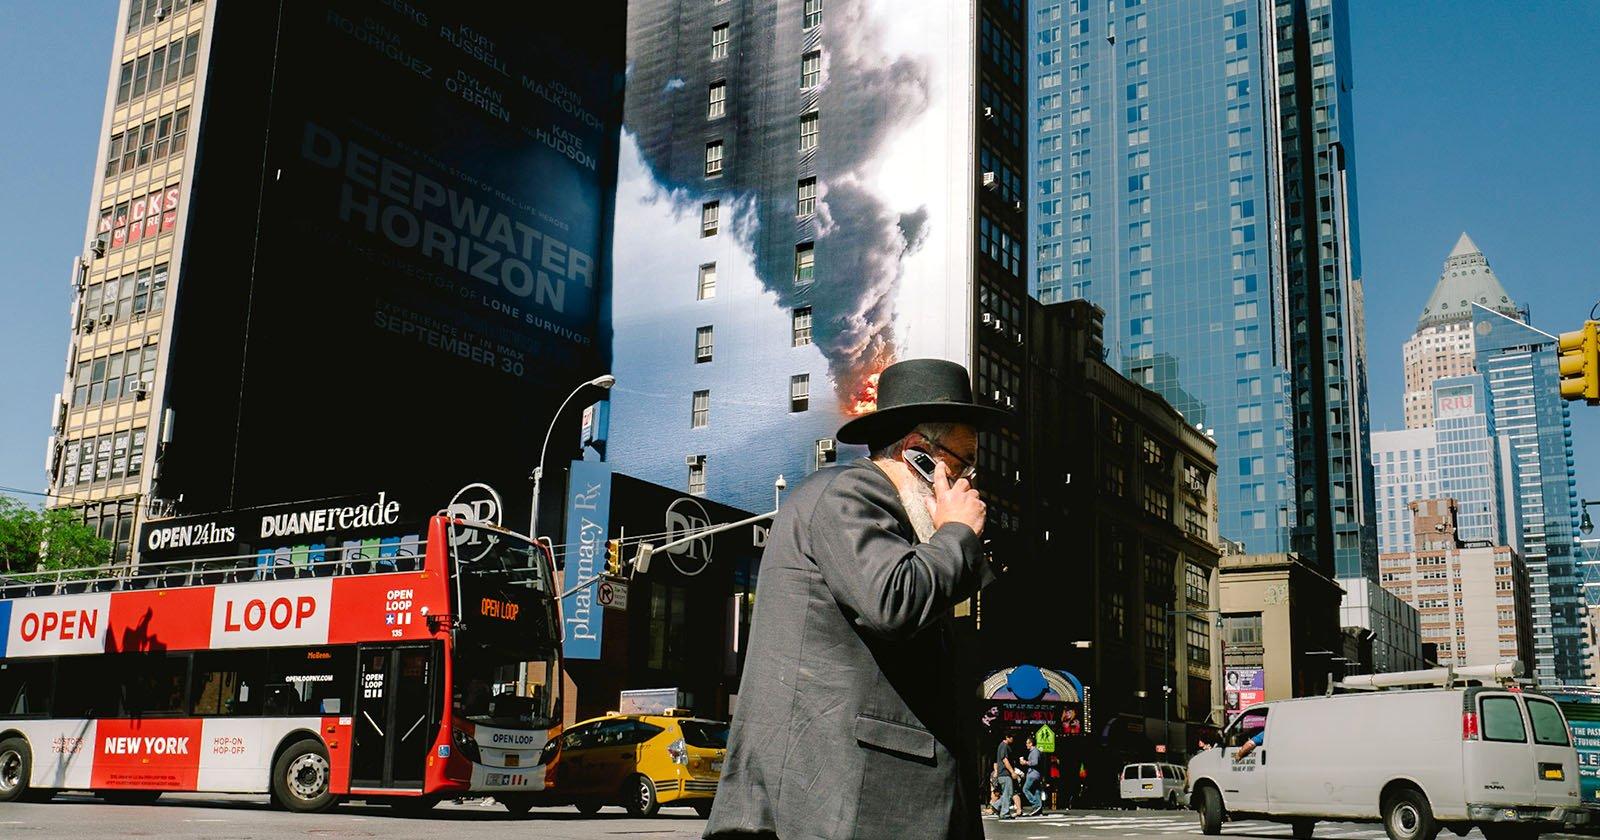 Street Photos of Coincidences on NYC Sidewalks